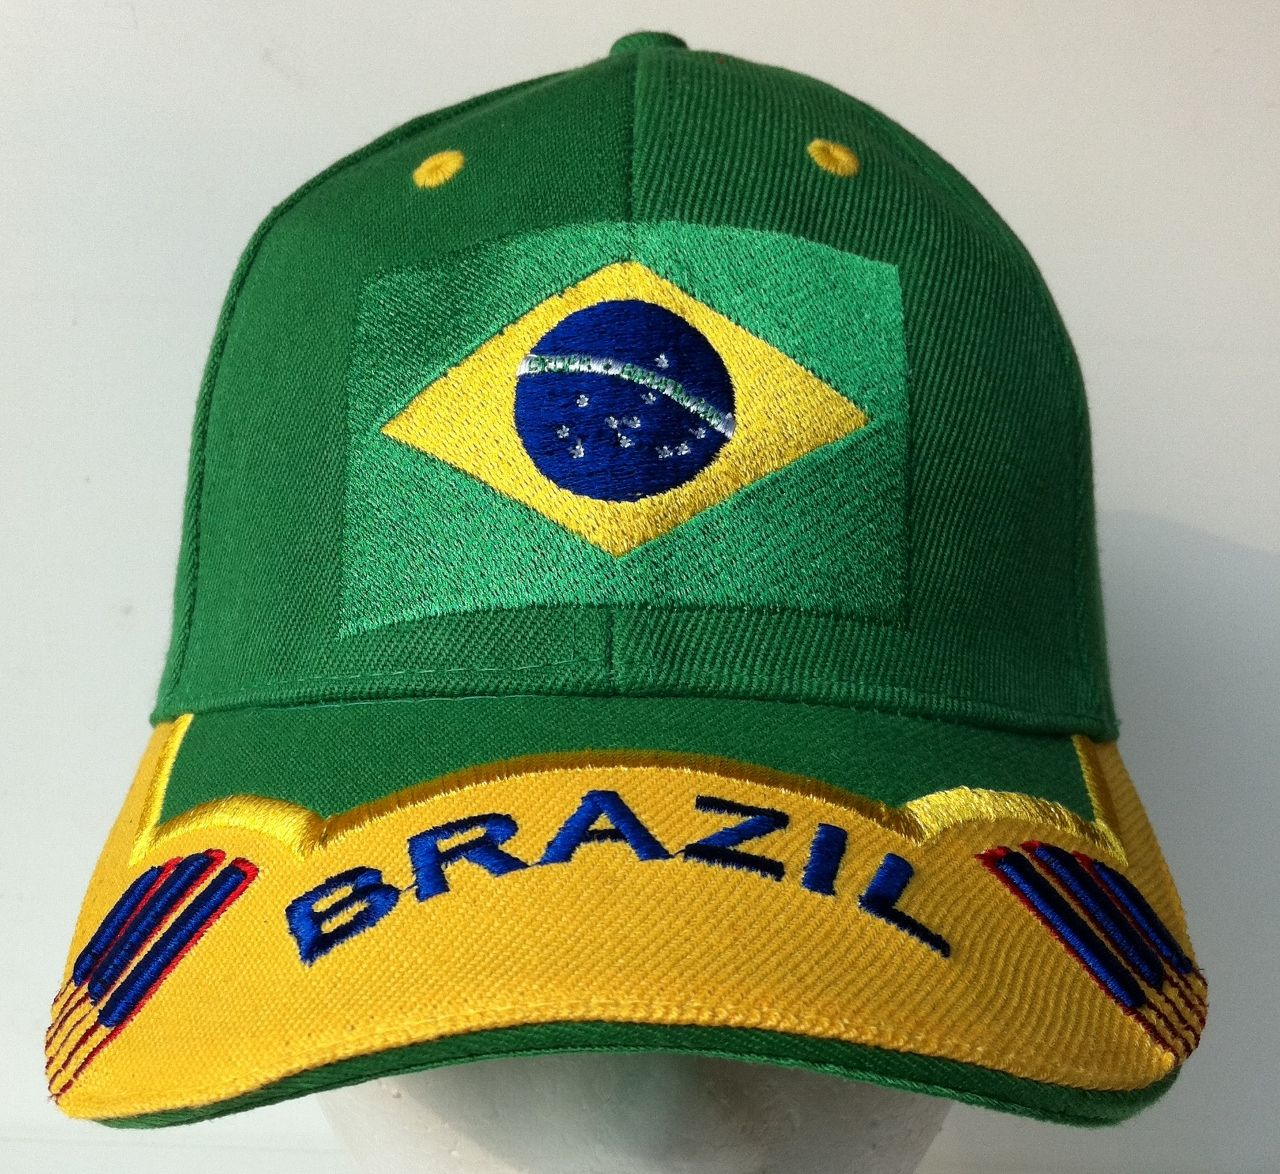 52d8adfdfda BRASIL BRAZIL BRAZILIAN WORLD SOCCER CUP ALL SPORTS CAP